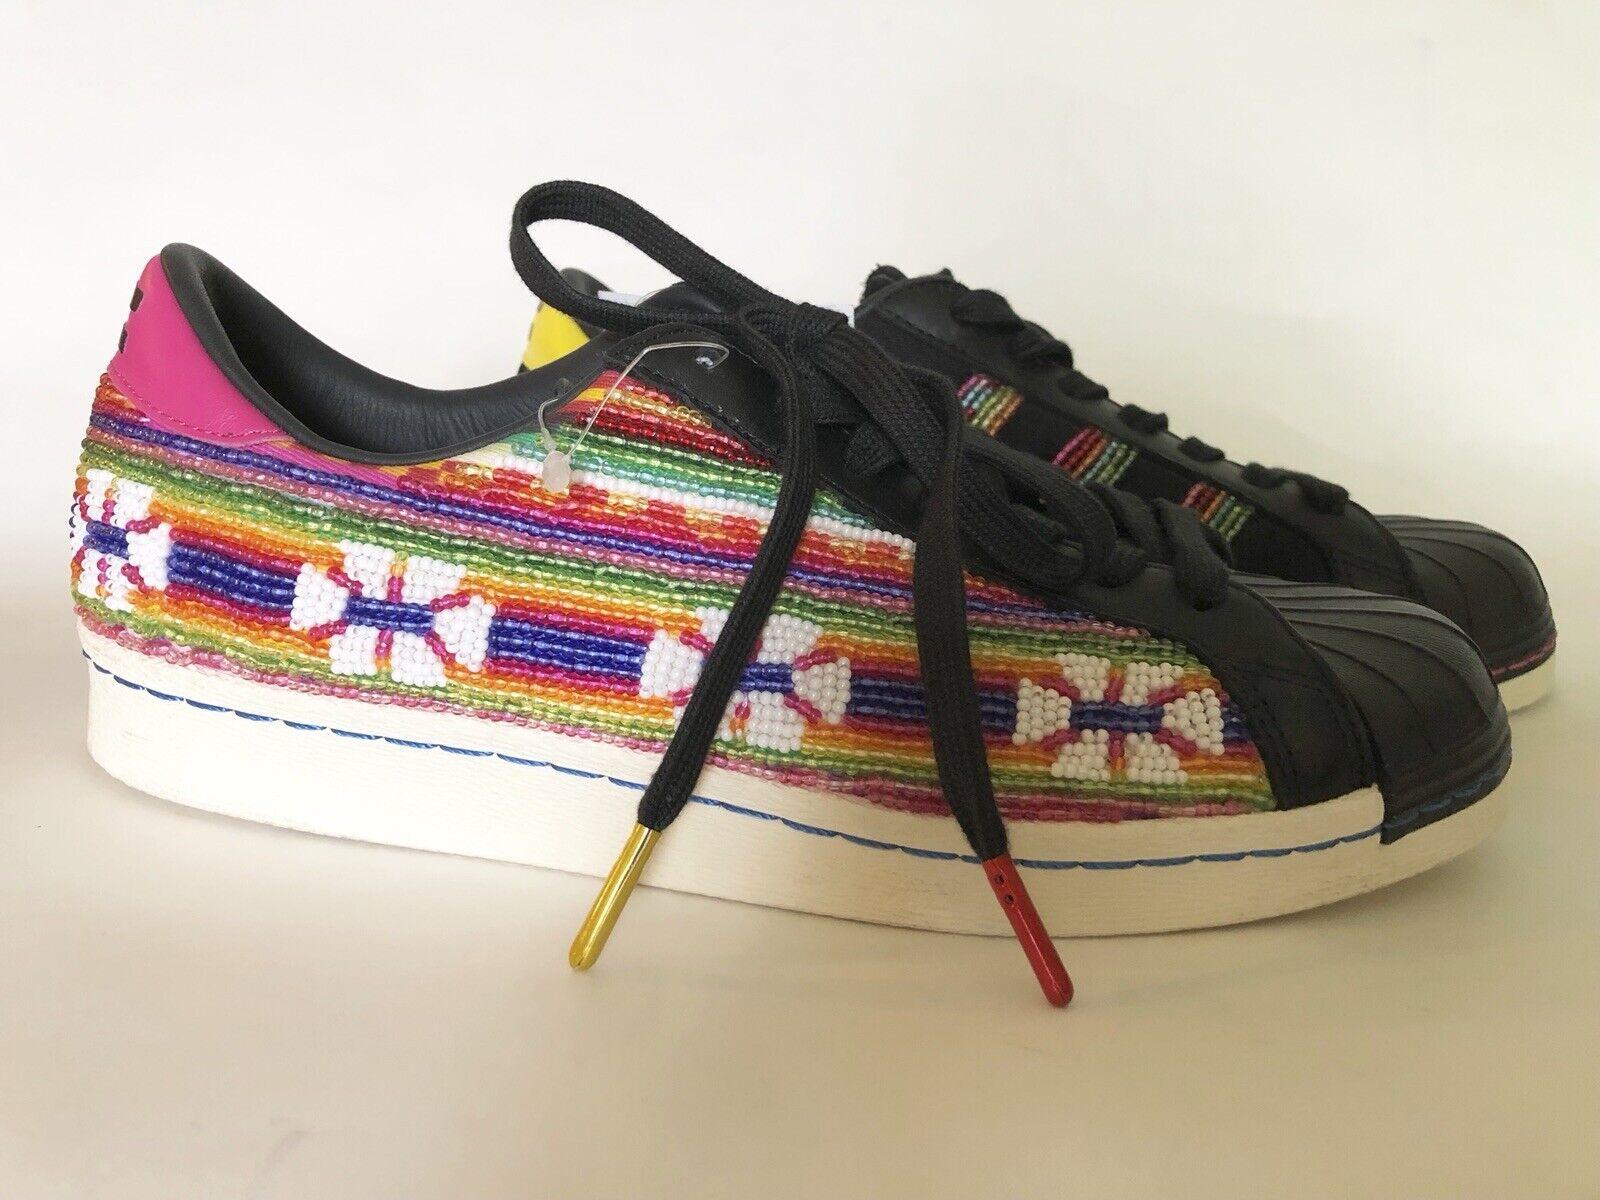 Adidas Superstar 80s Pioneer Black Beaded Pharrell Bolivian Beads B25965 6.5